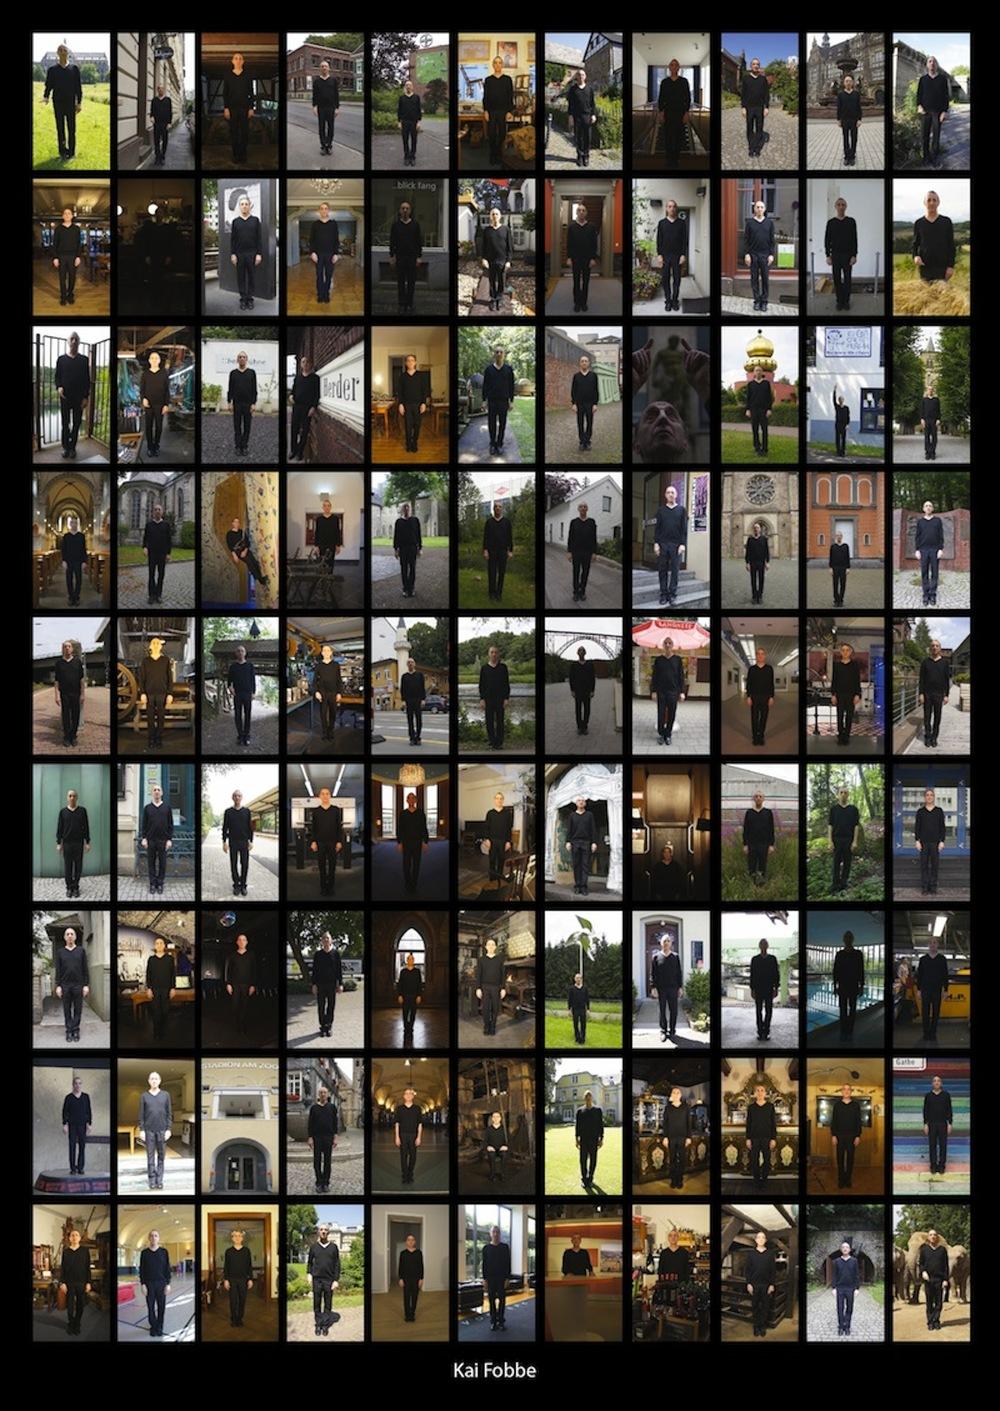 video installation 99 orte kai fobbe jean laurent sasportes public art